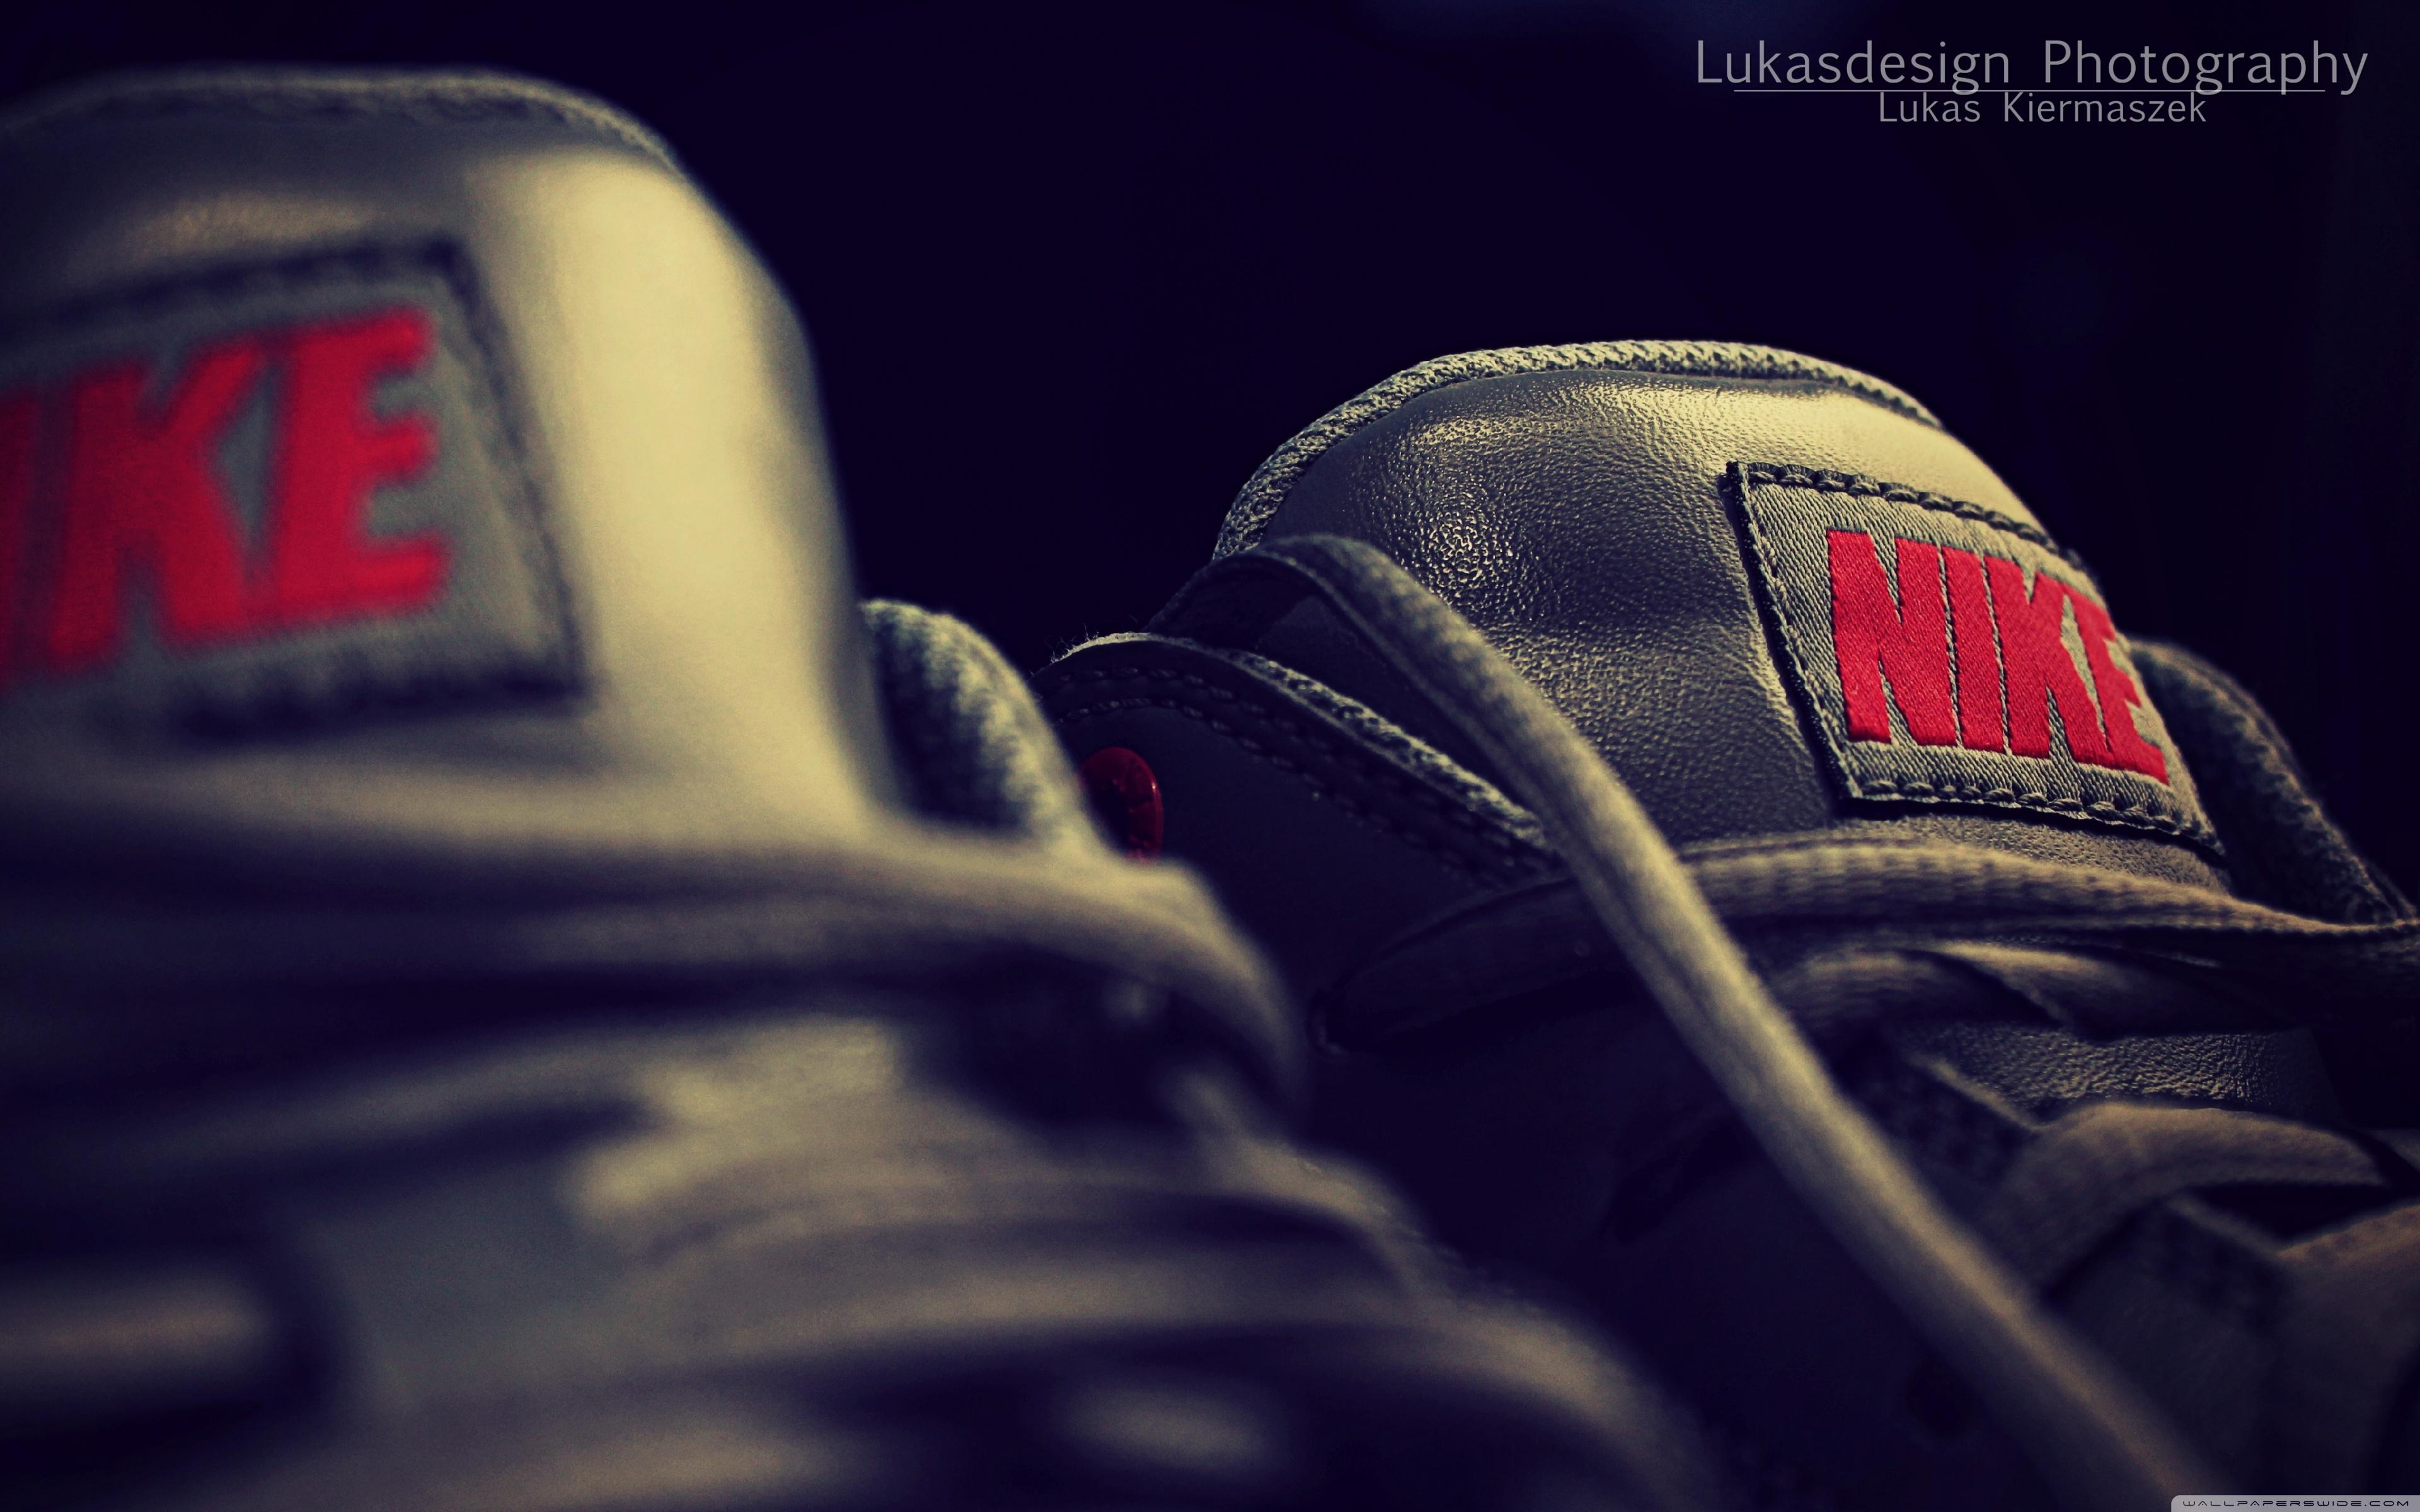 Nike Shoes Wallpaper 4k   3840x2400 Wallpaper   teahubio 3840x2400